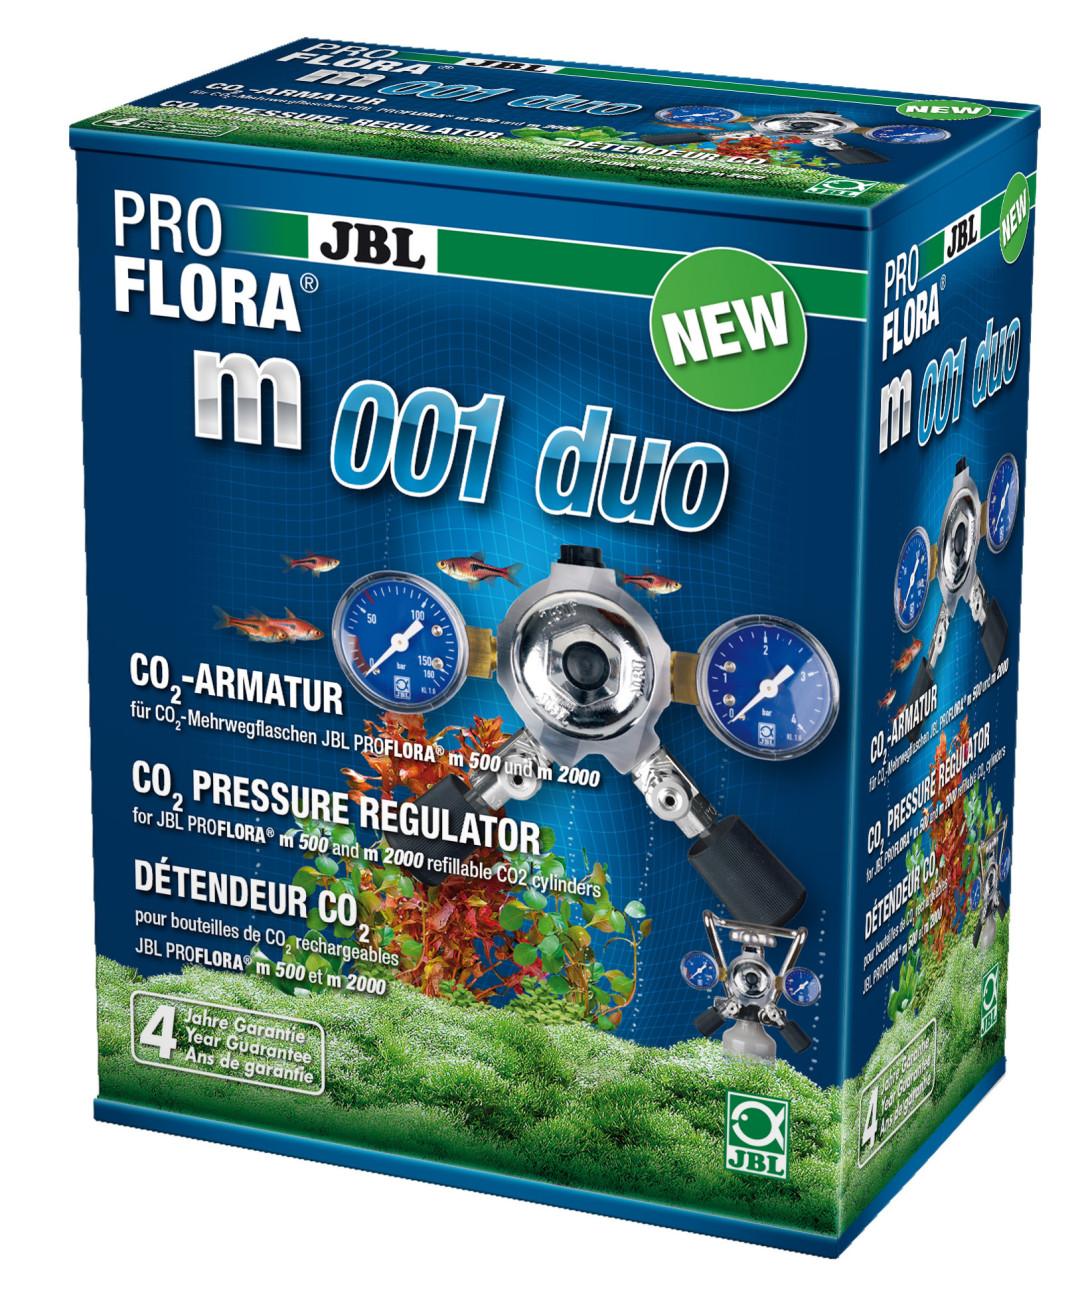 JBL armatuur ProFlora m001 duo